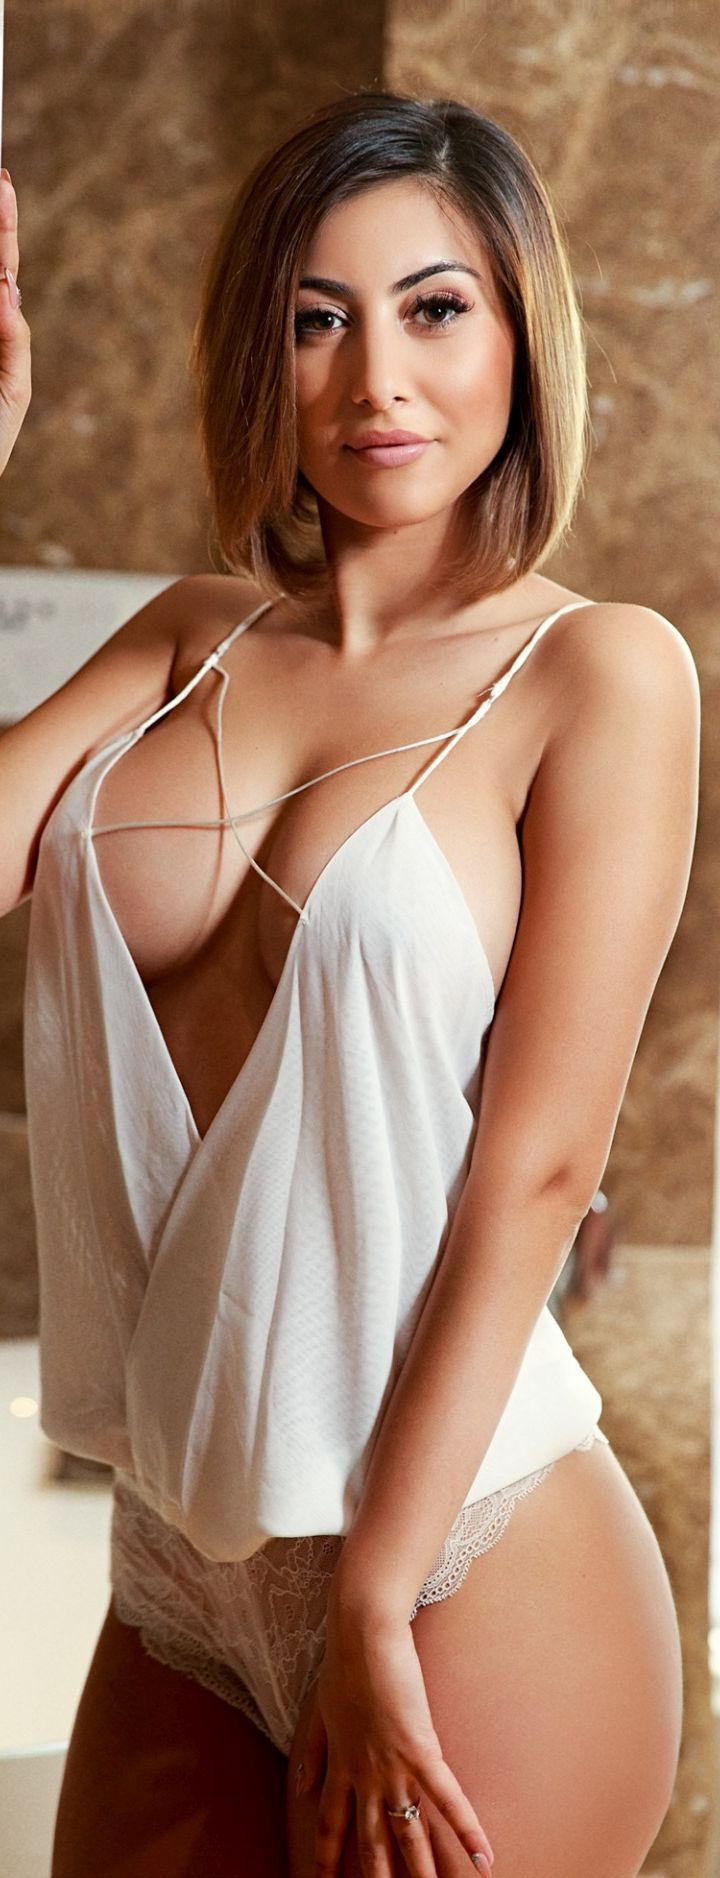 gwen garci nude boobs